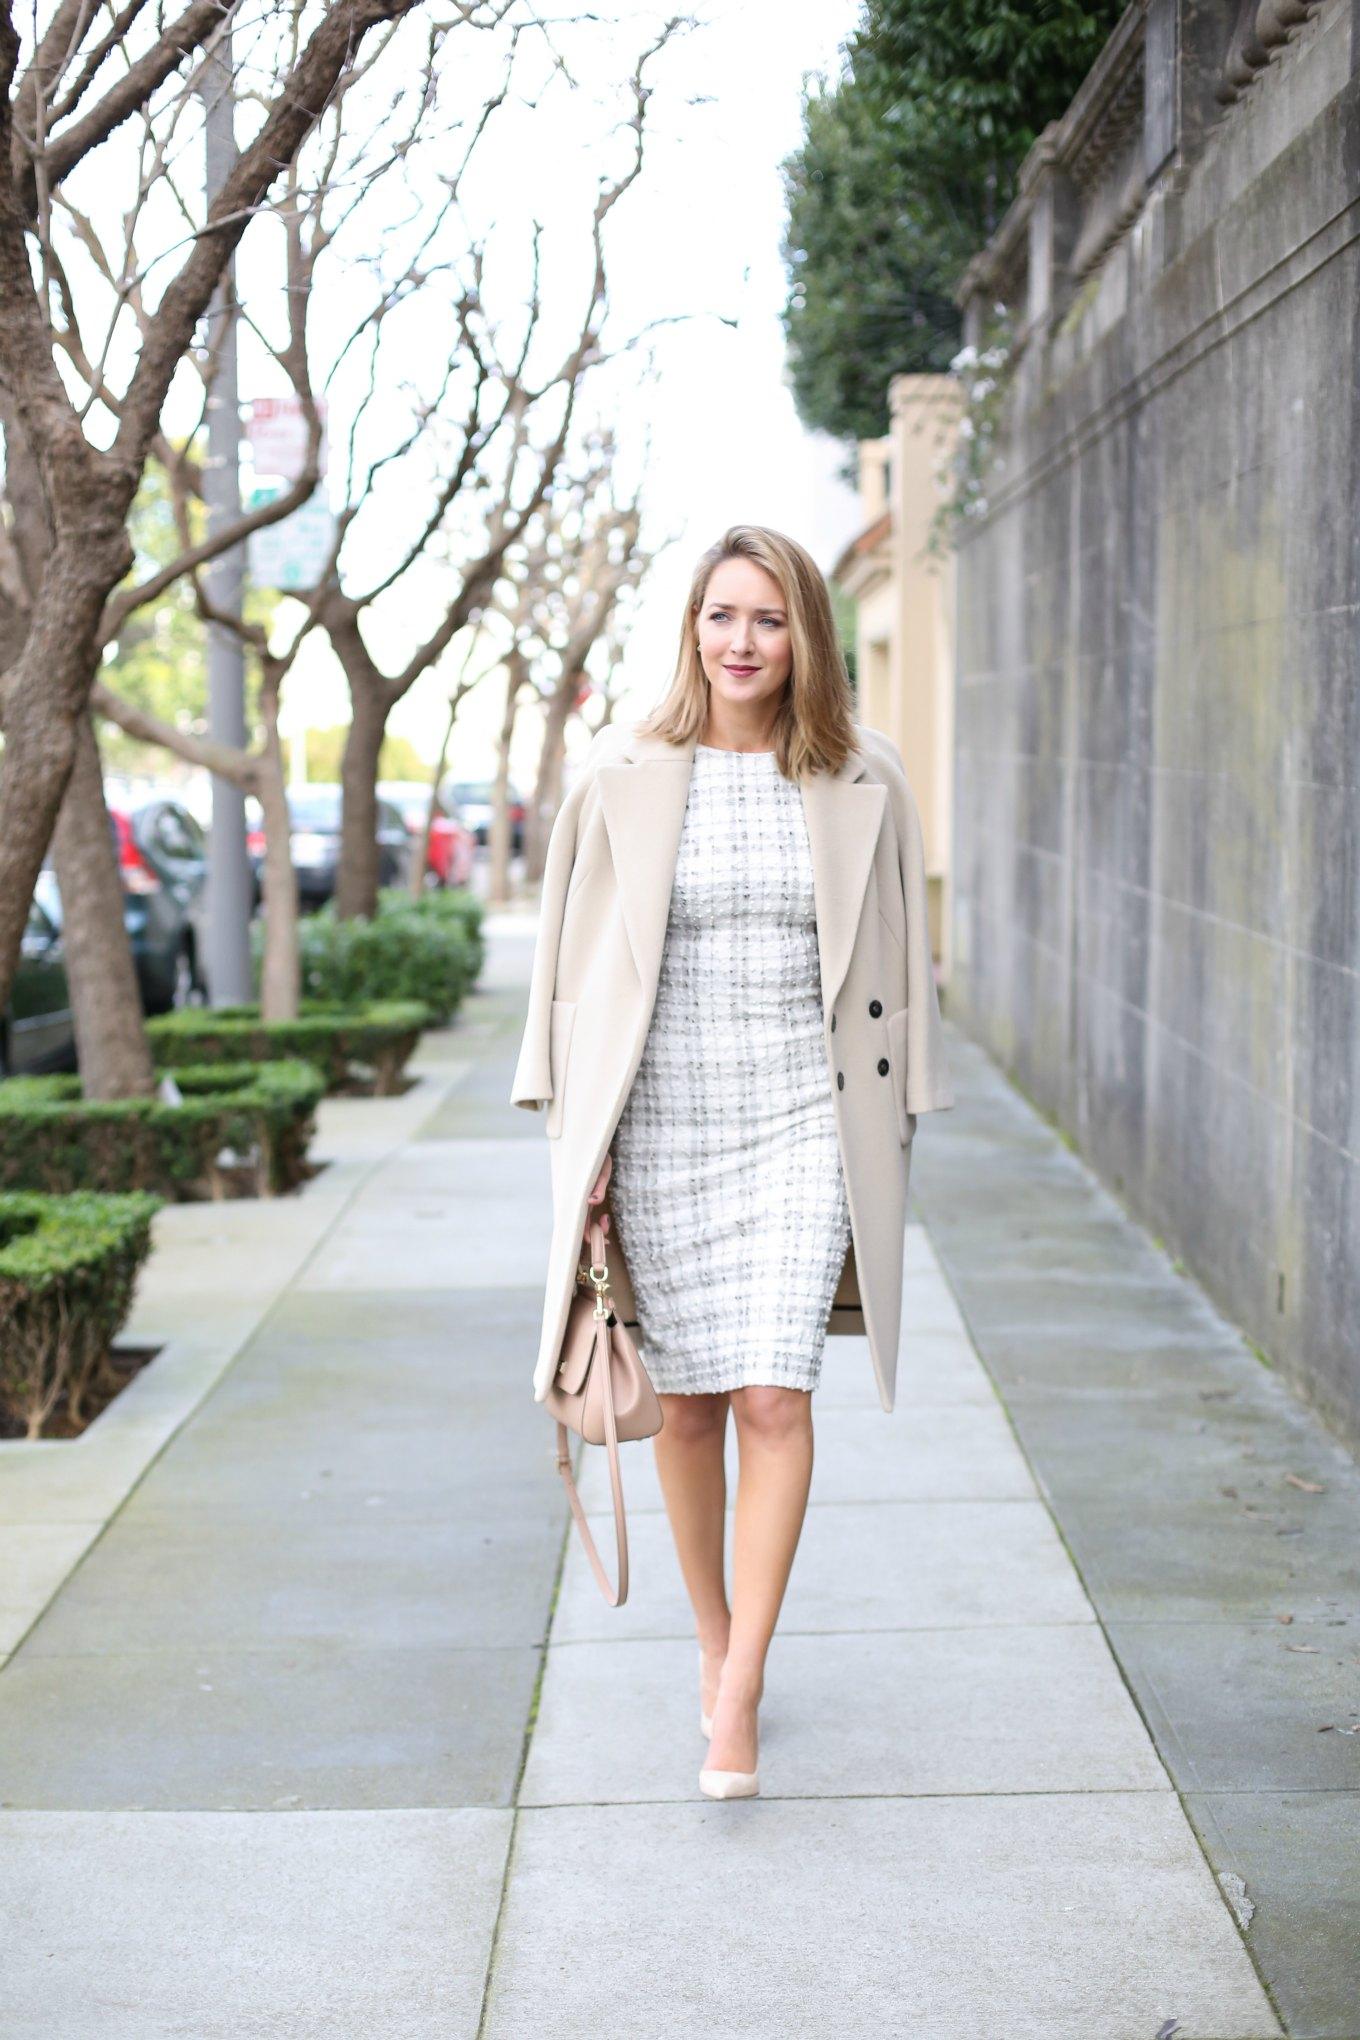 dress-the-population-ivory-beige-nude-sheath-dress-v-back-kate-spade-licorice-suede-pumps-dolce-gabbana-sicily-work-wear-style-blog-san-francisco-mary-orton-memorandum-fashion-blogger1